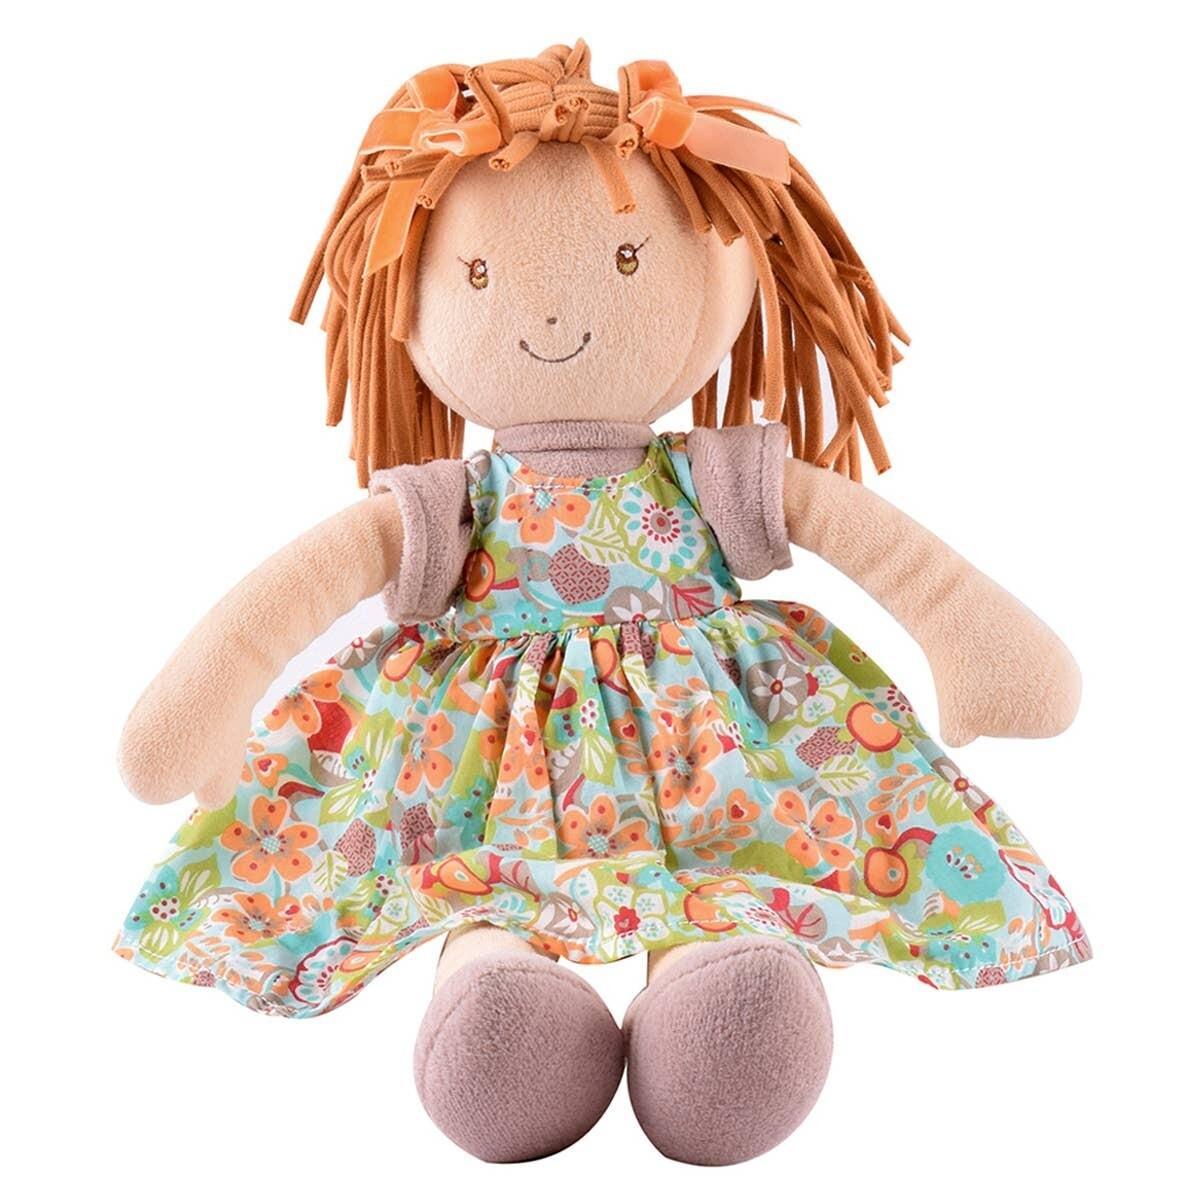 Libby Lu Bonikka Doll